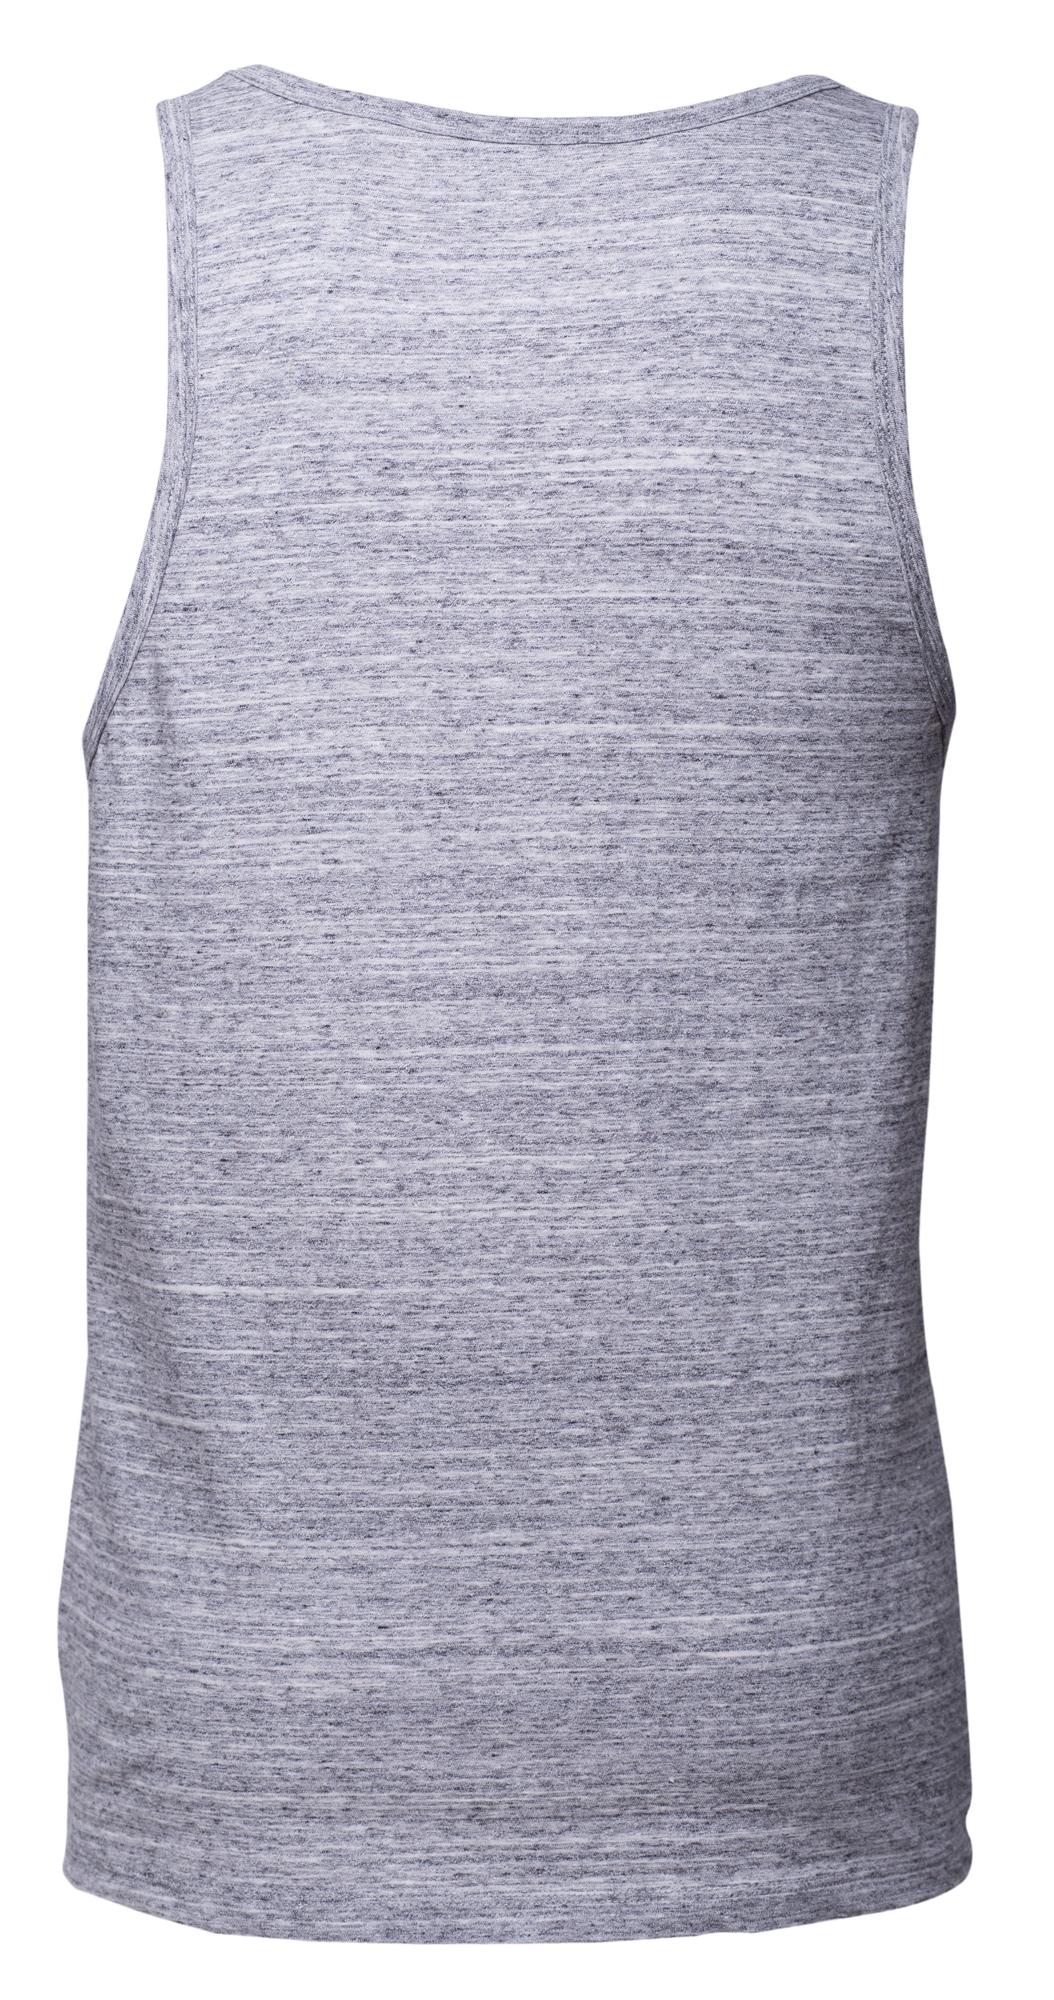 "Yoga-Tank-Top ""Birds""- melange-grey / grey"